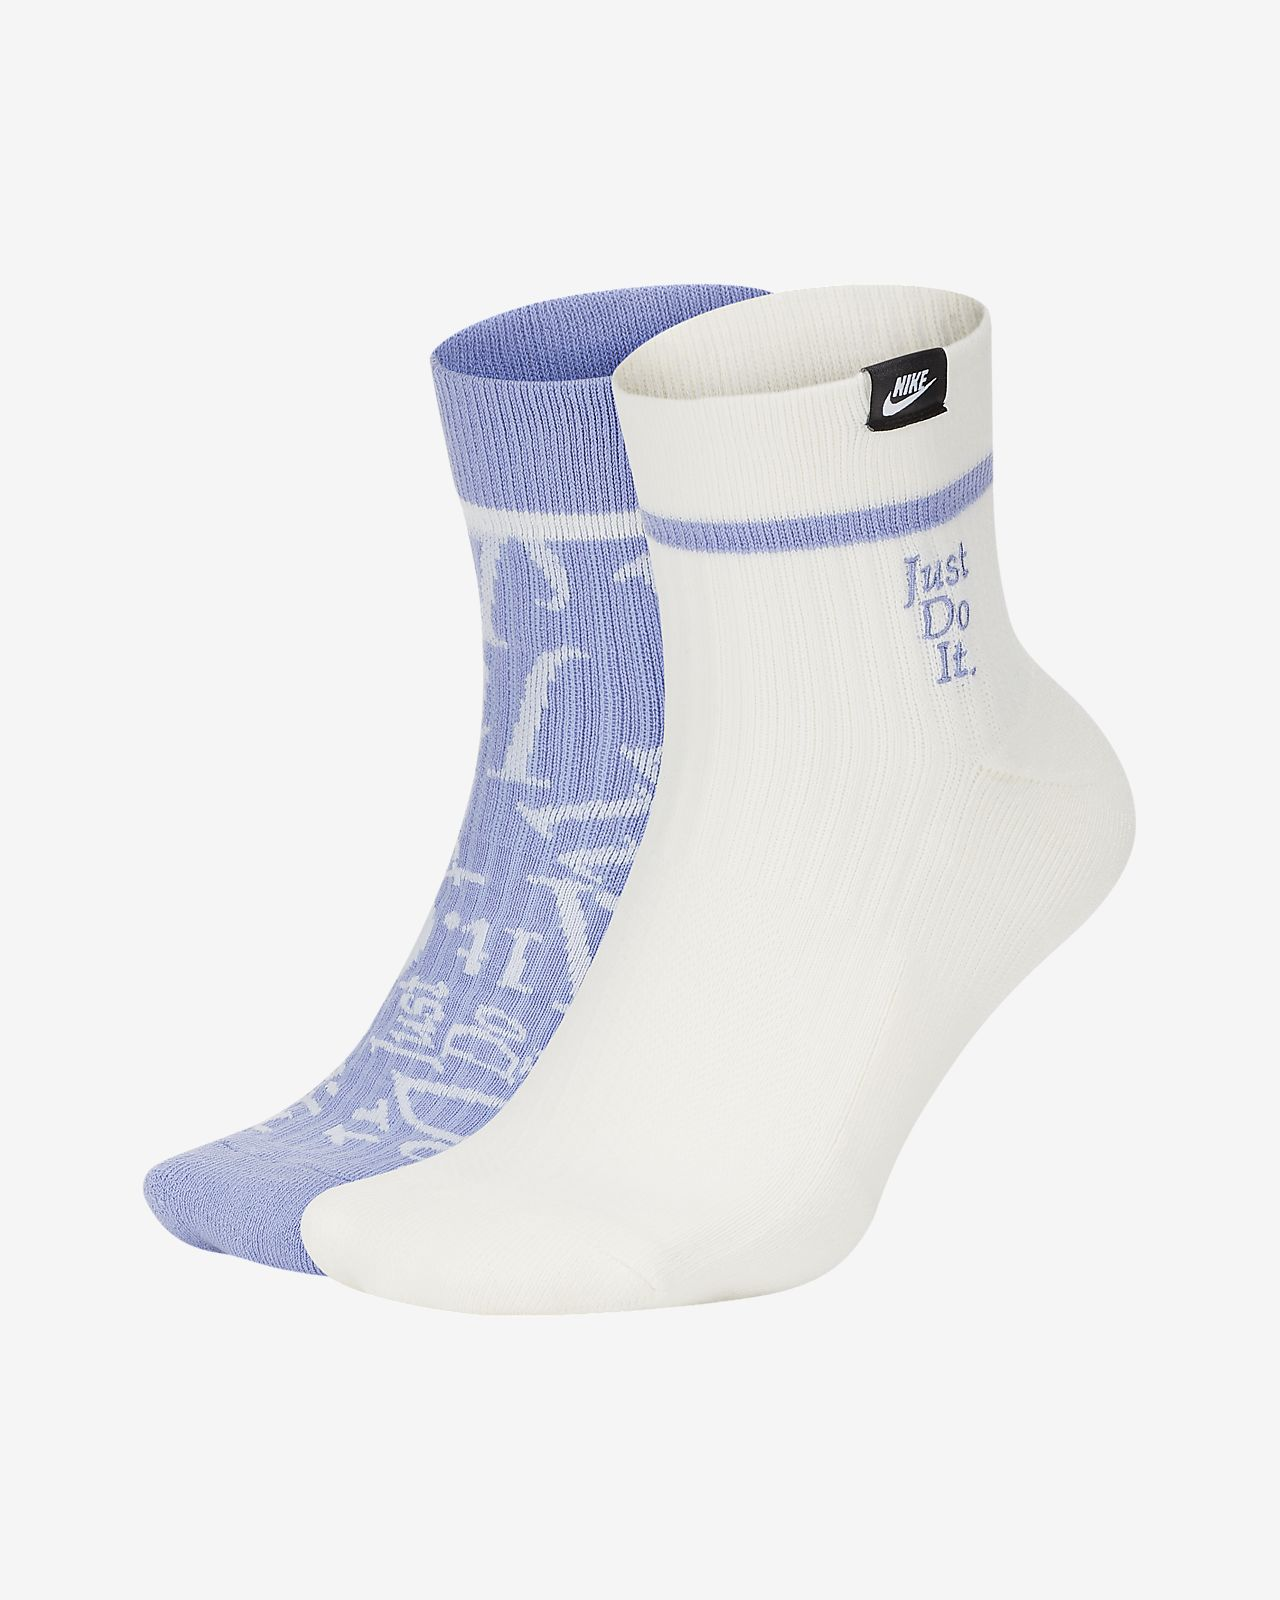 Calcetines hasta el tobillo Nike SNKR Sox JDI (2 pares)